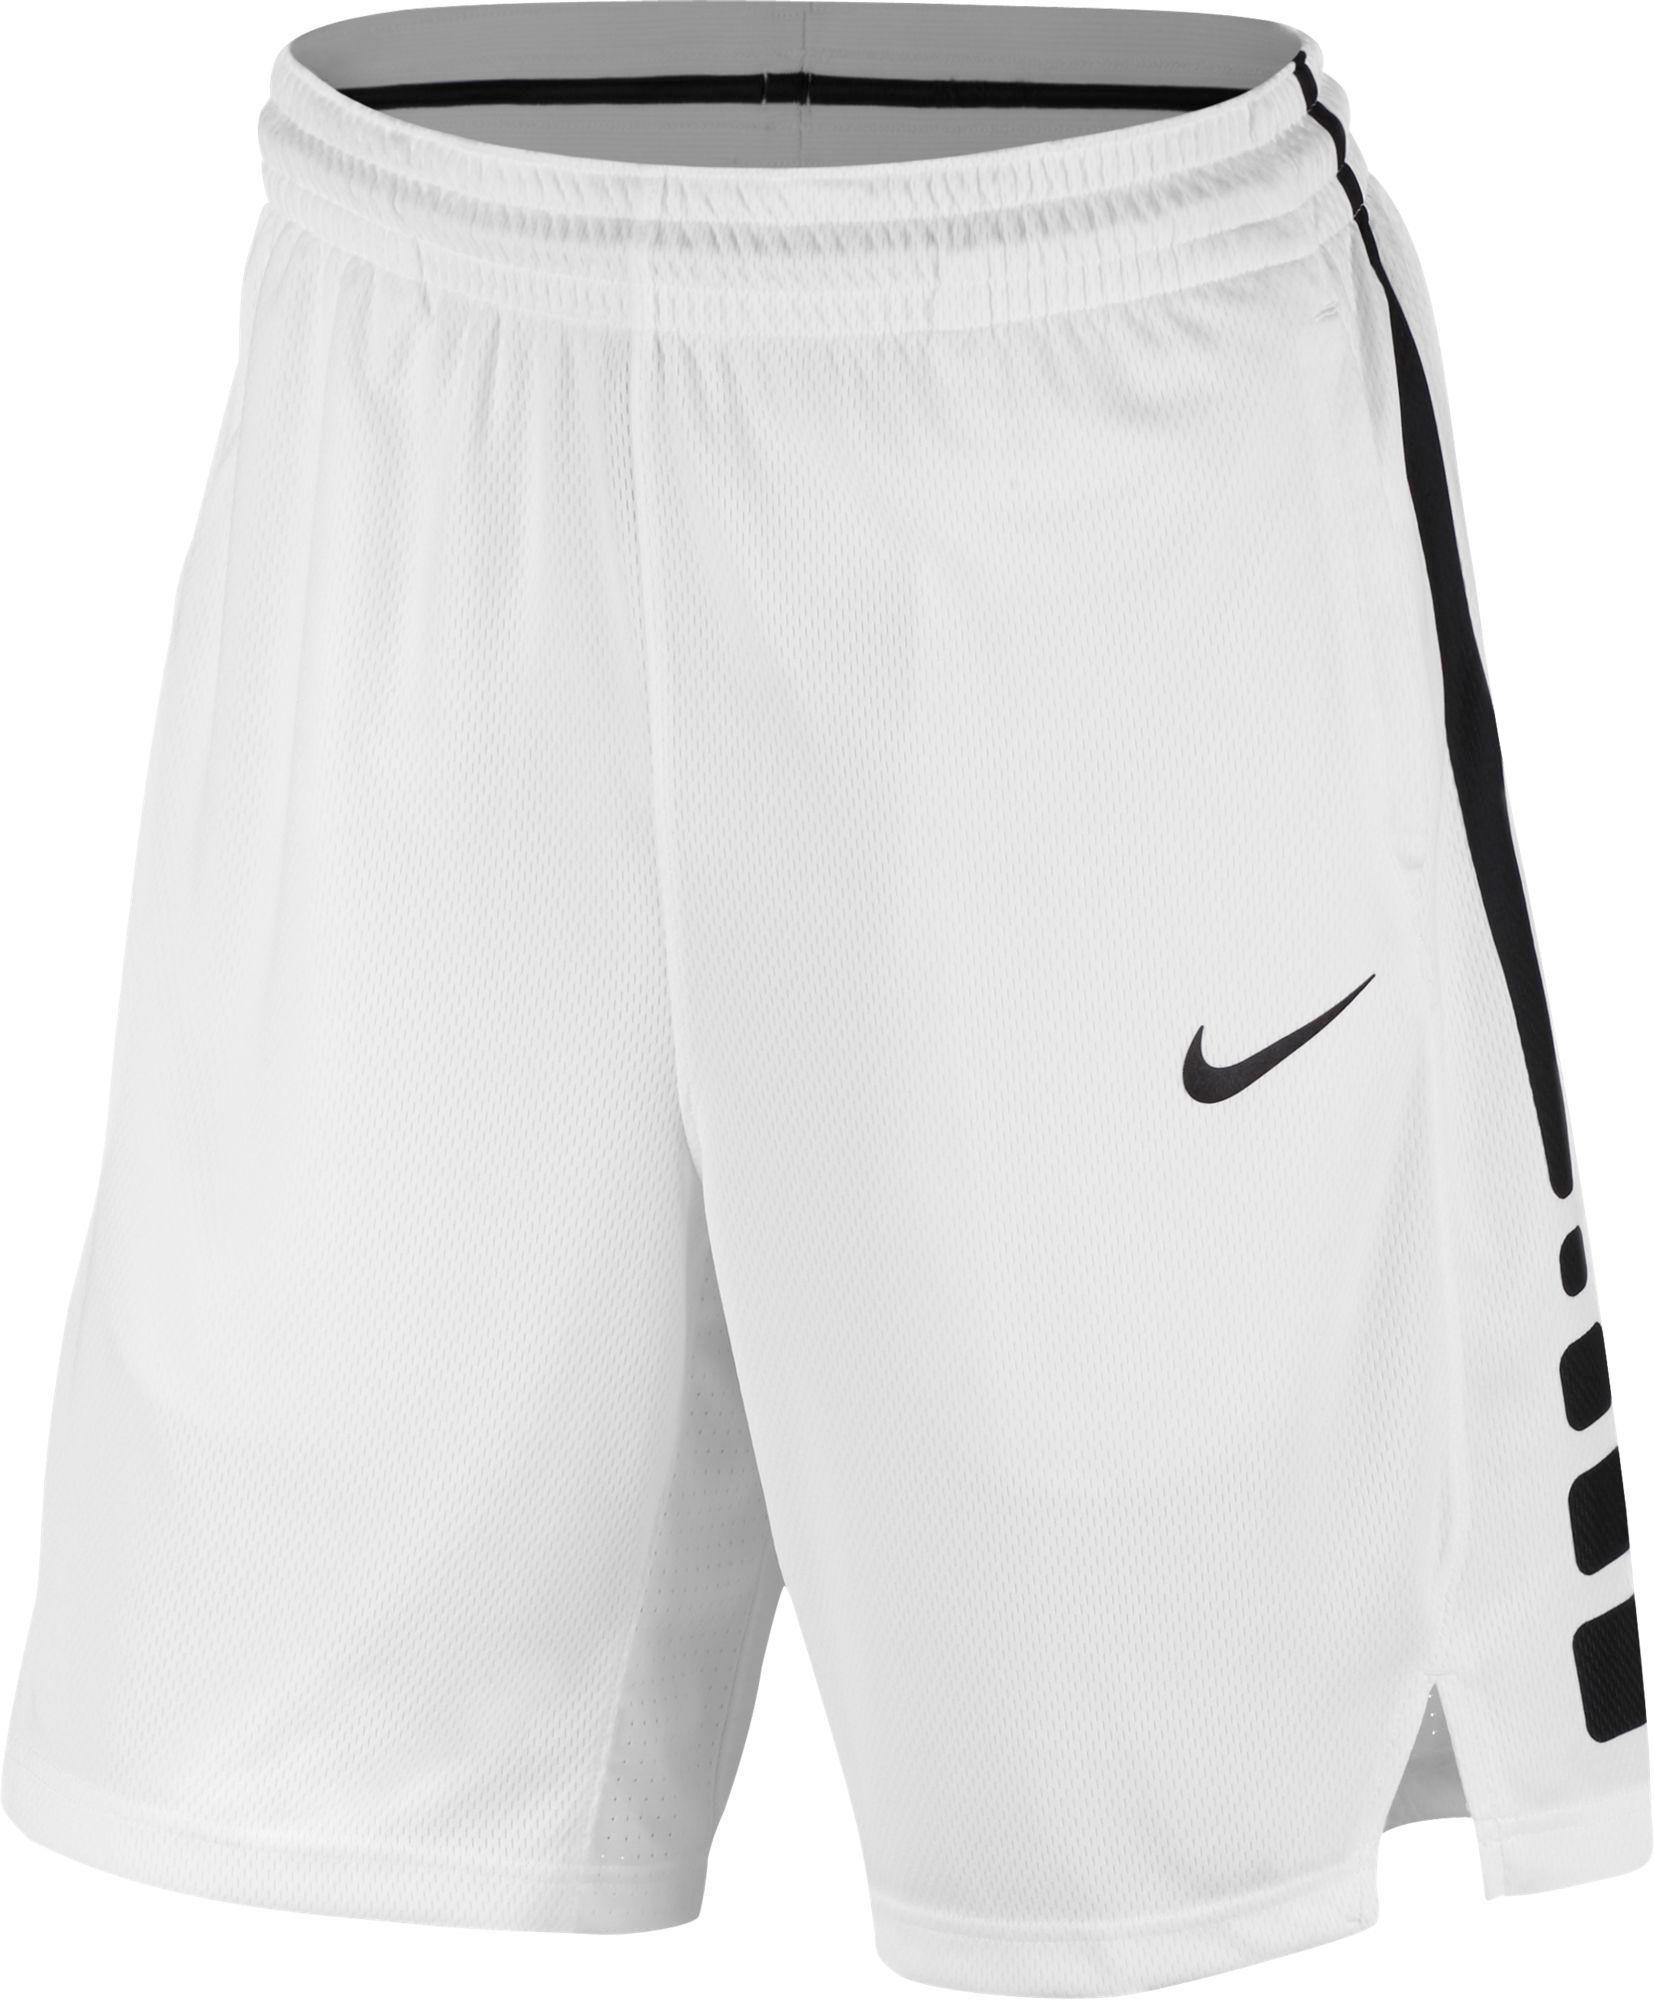 ba3f781c1aa3 Nike - White Elite Stripe Basketball Shorts for Men - Lyst. View fullscreen